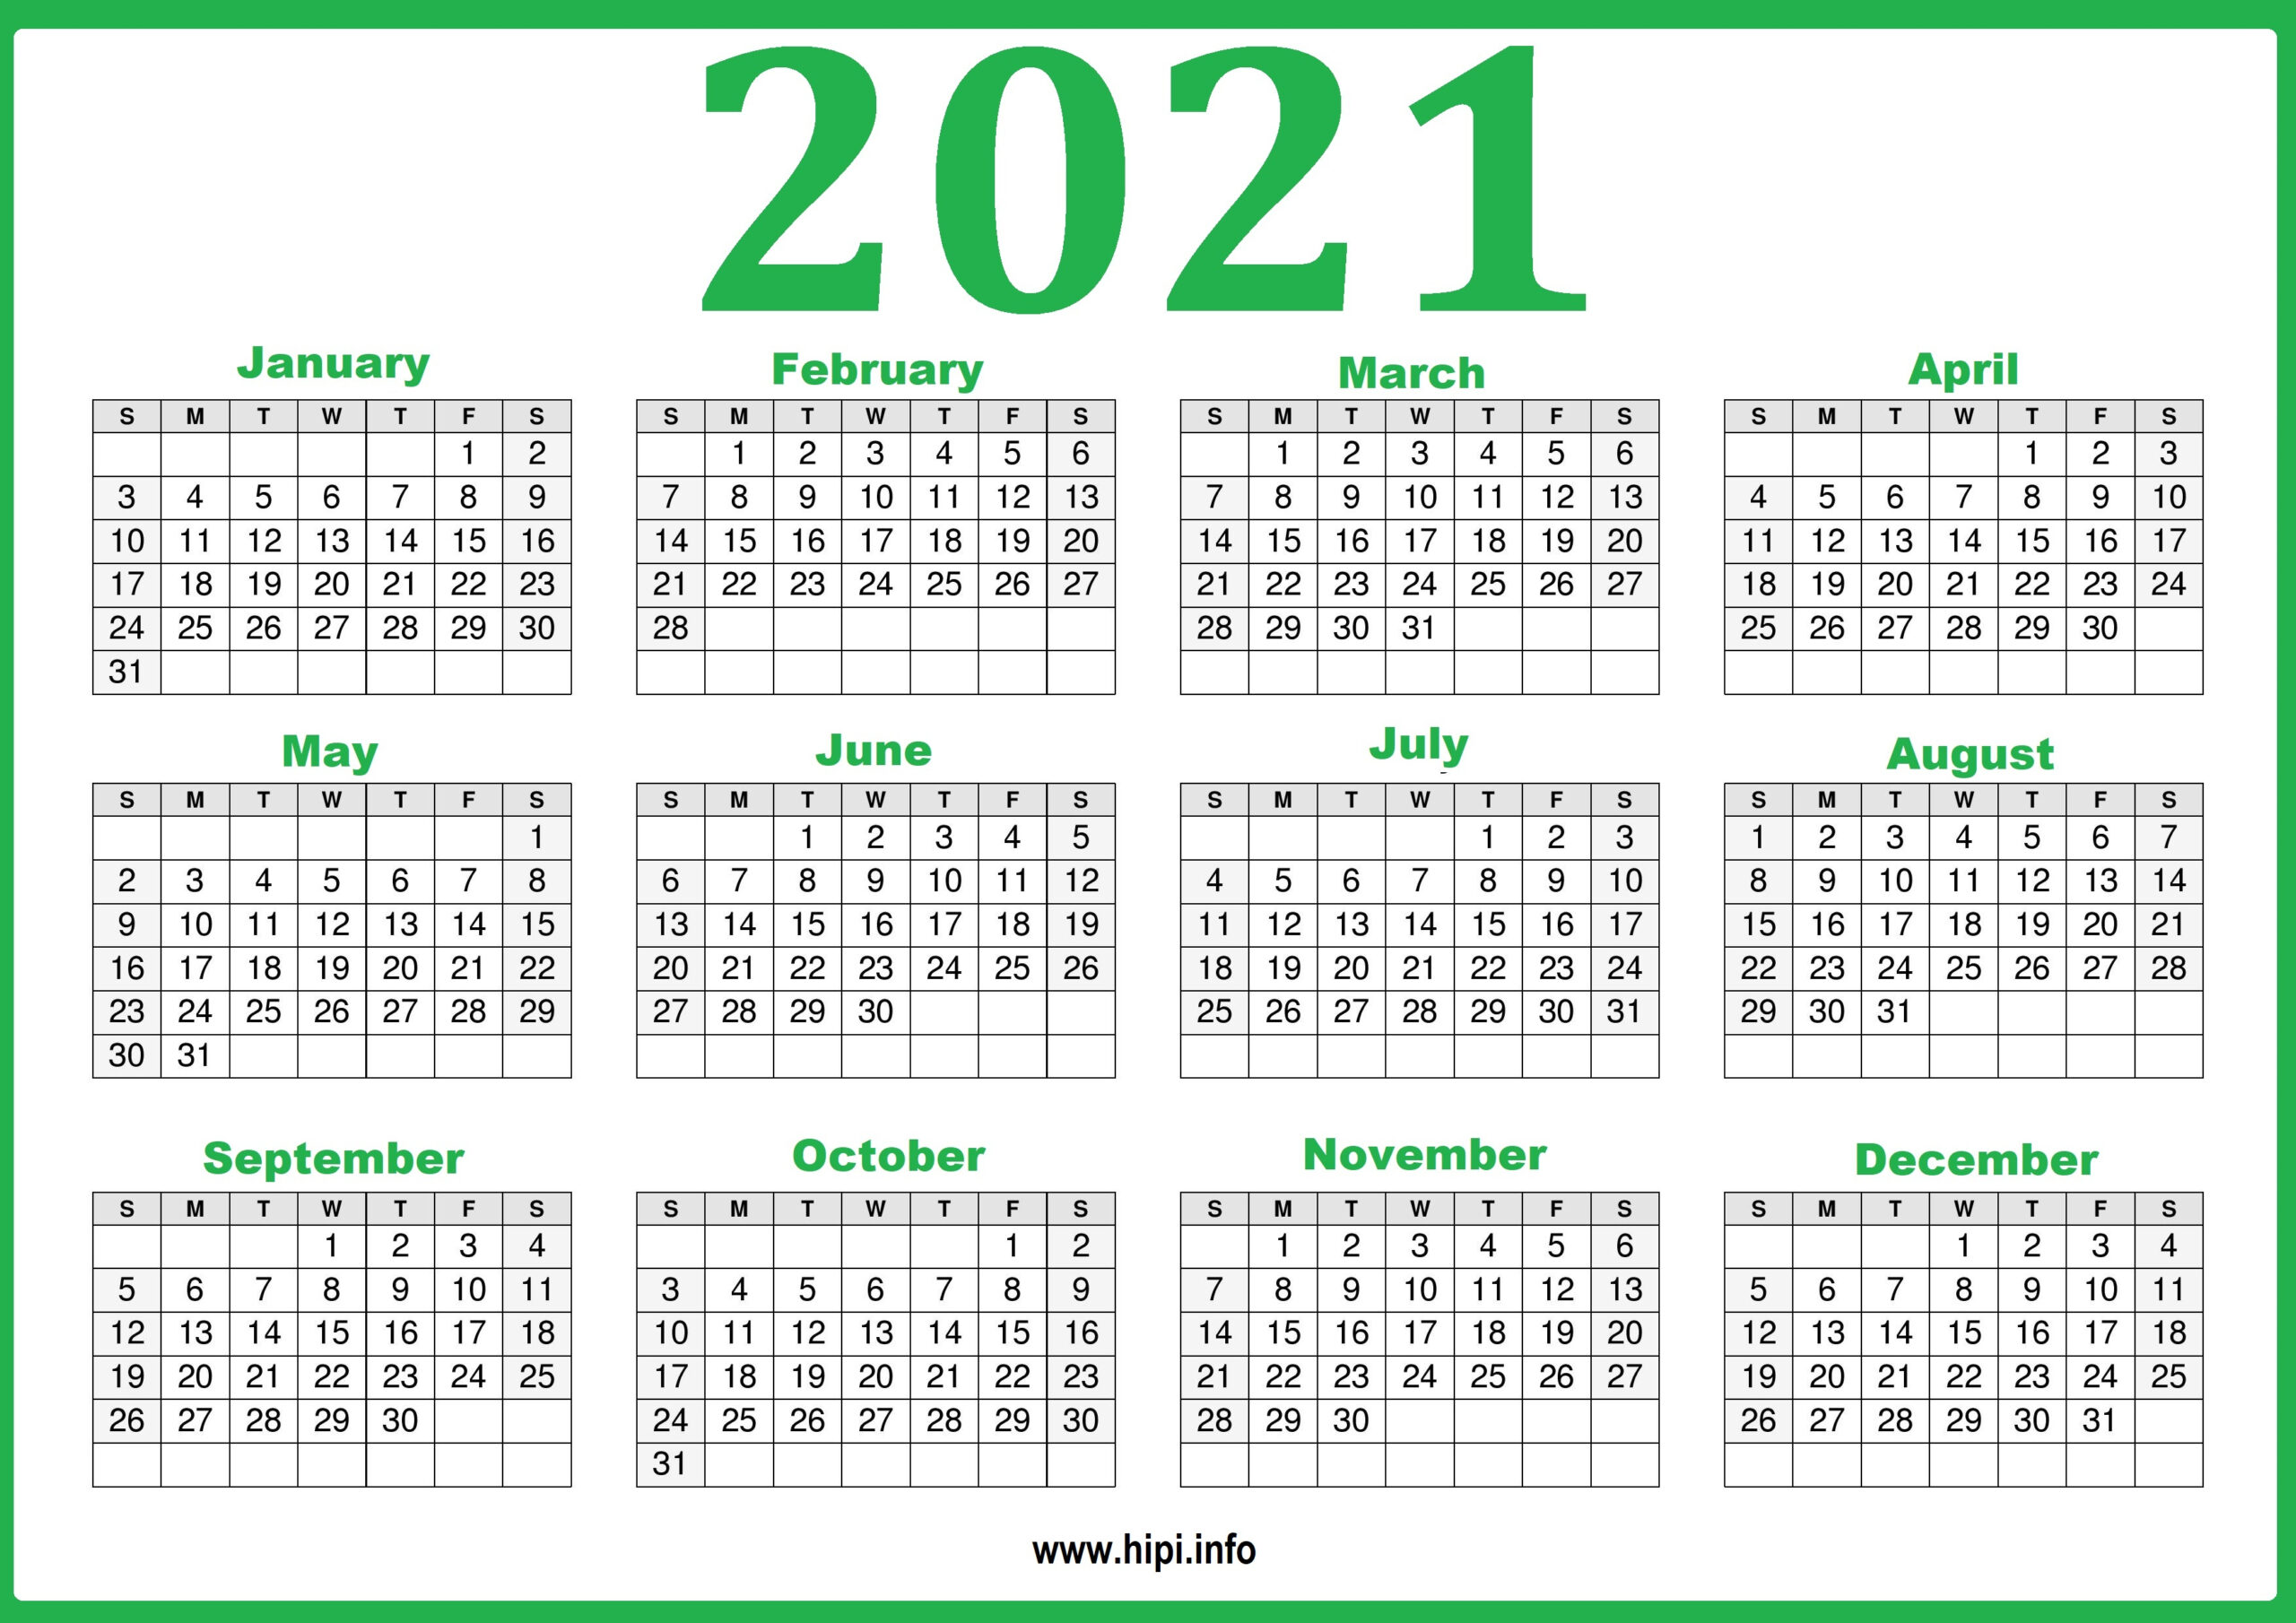 Free Printable 2021 Calendar, Pink And Green - Hipi pertaining to Printable Calendars 2021 Sunday To Saturday